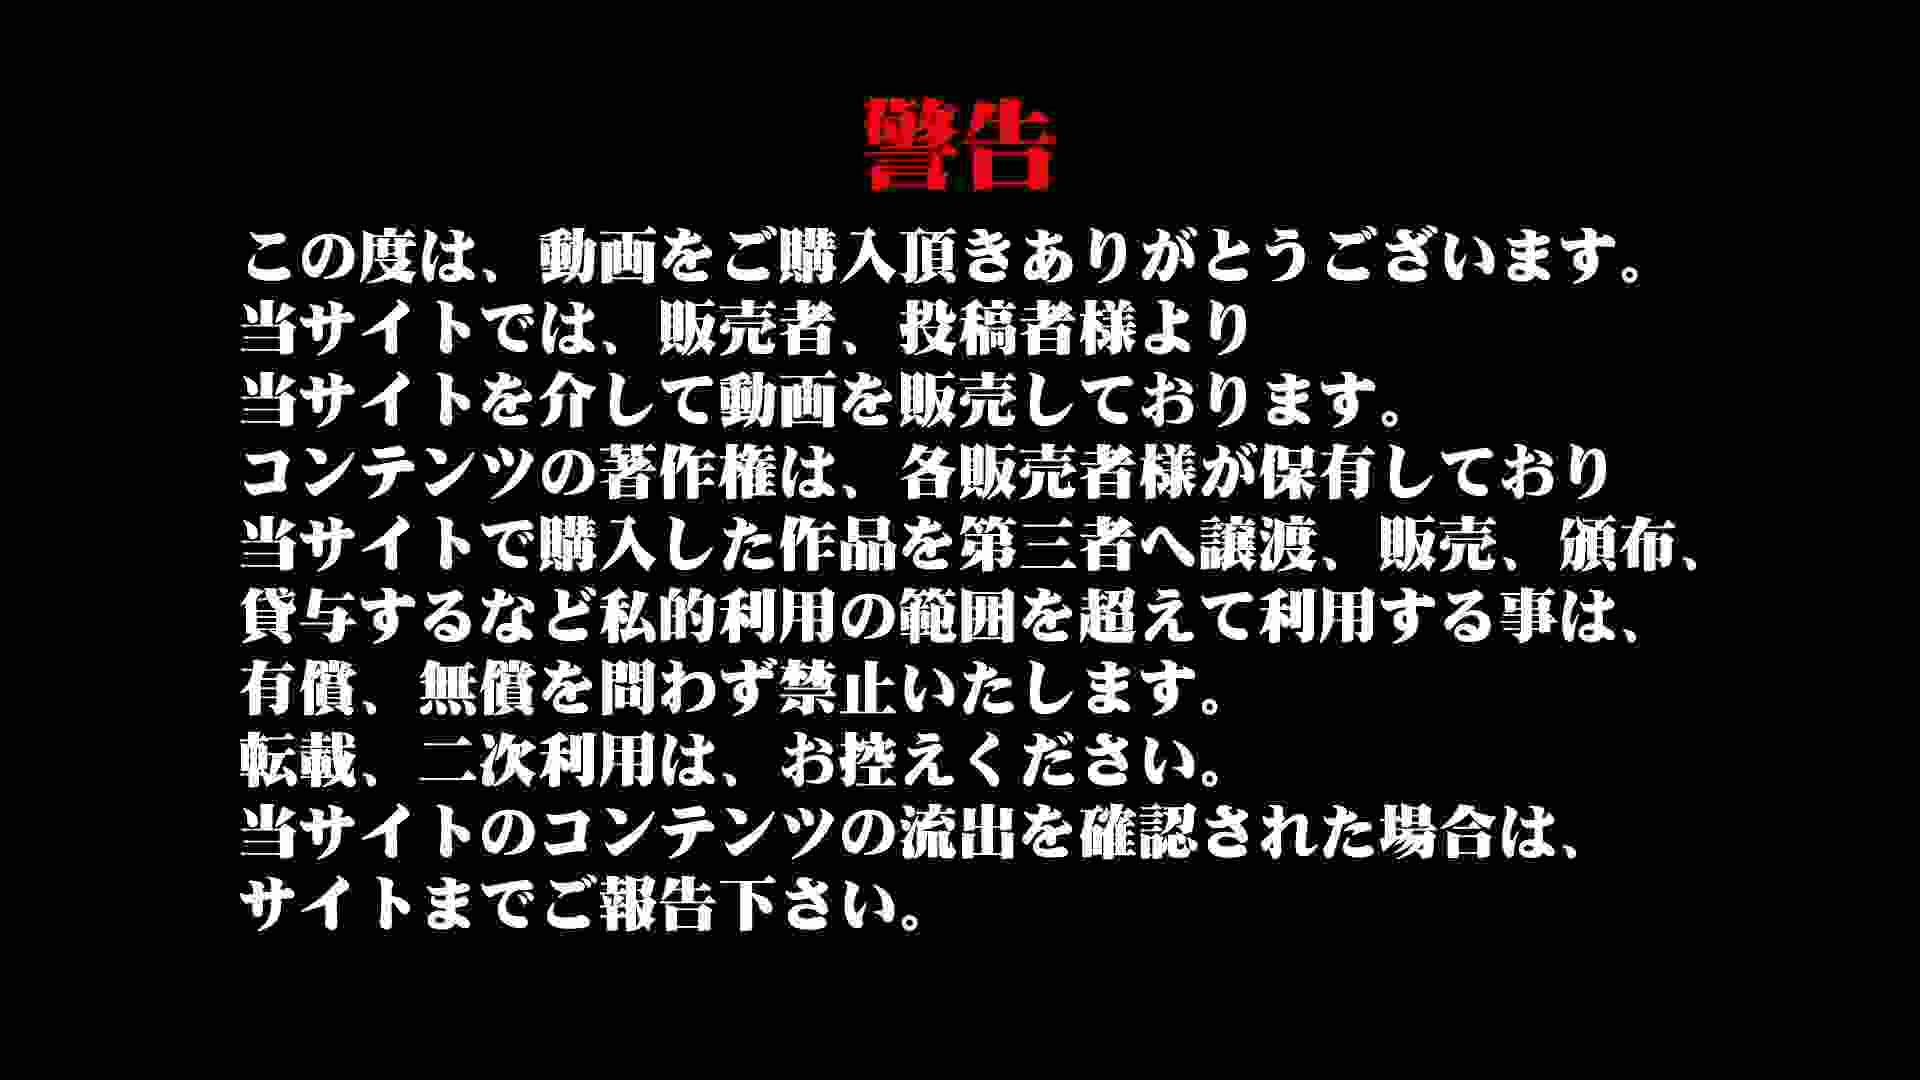 Aquaな露天風呂Vol.915 OLすけべ画像 オマンコ動画キャプチャ 99連発 5